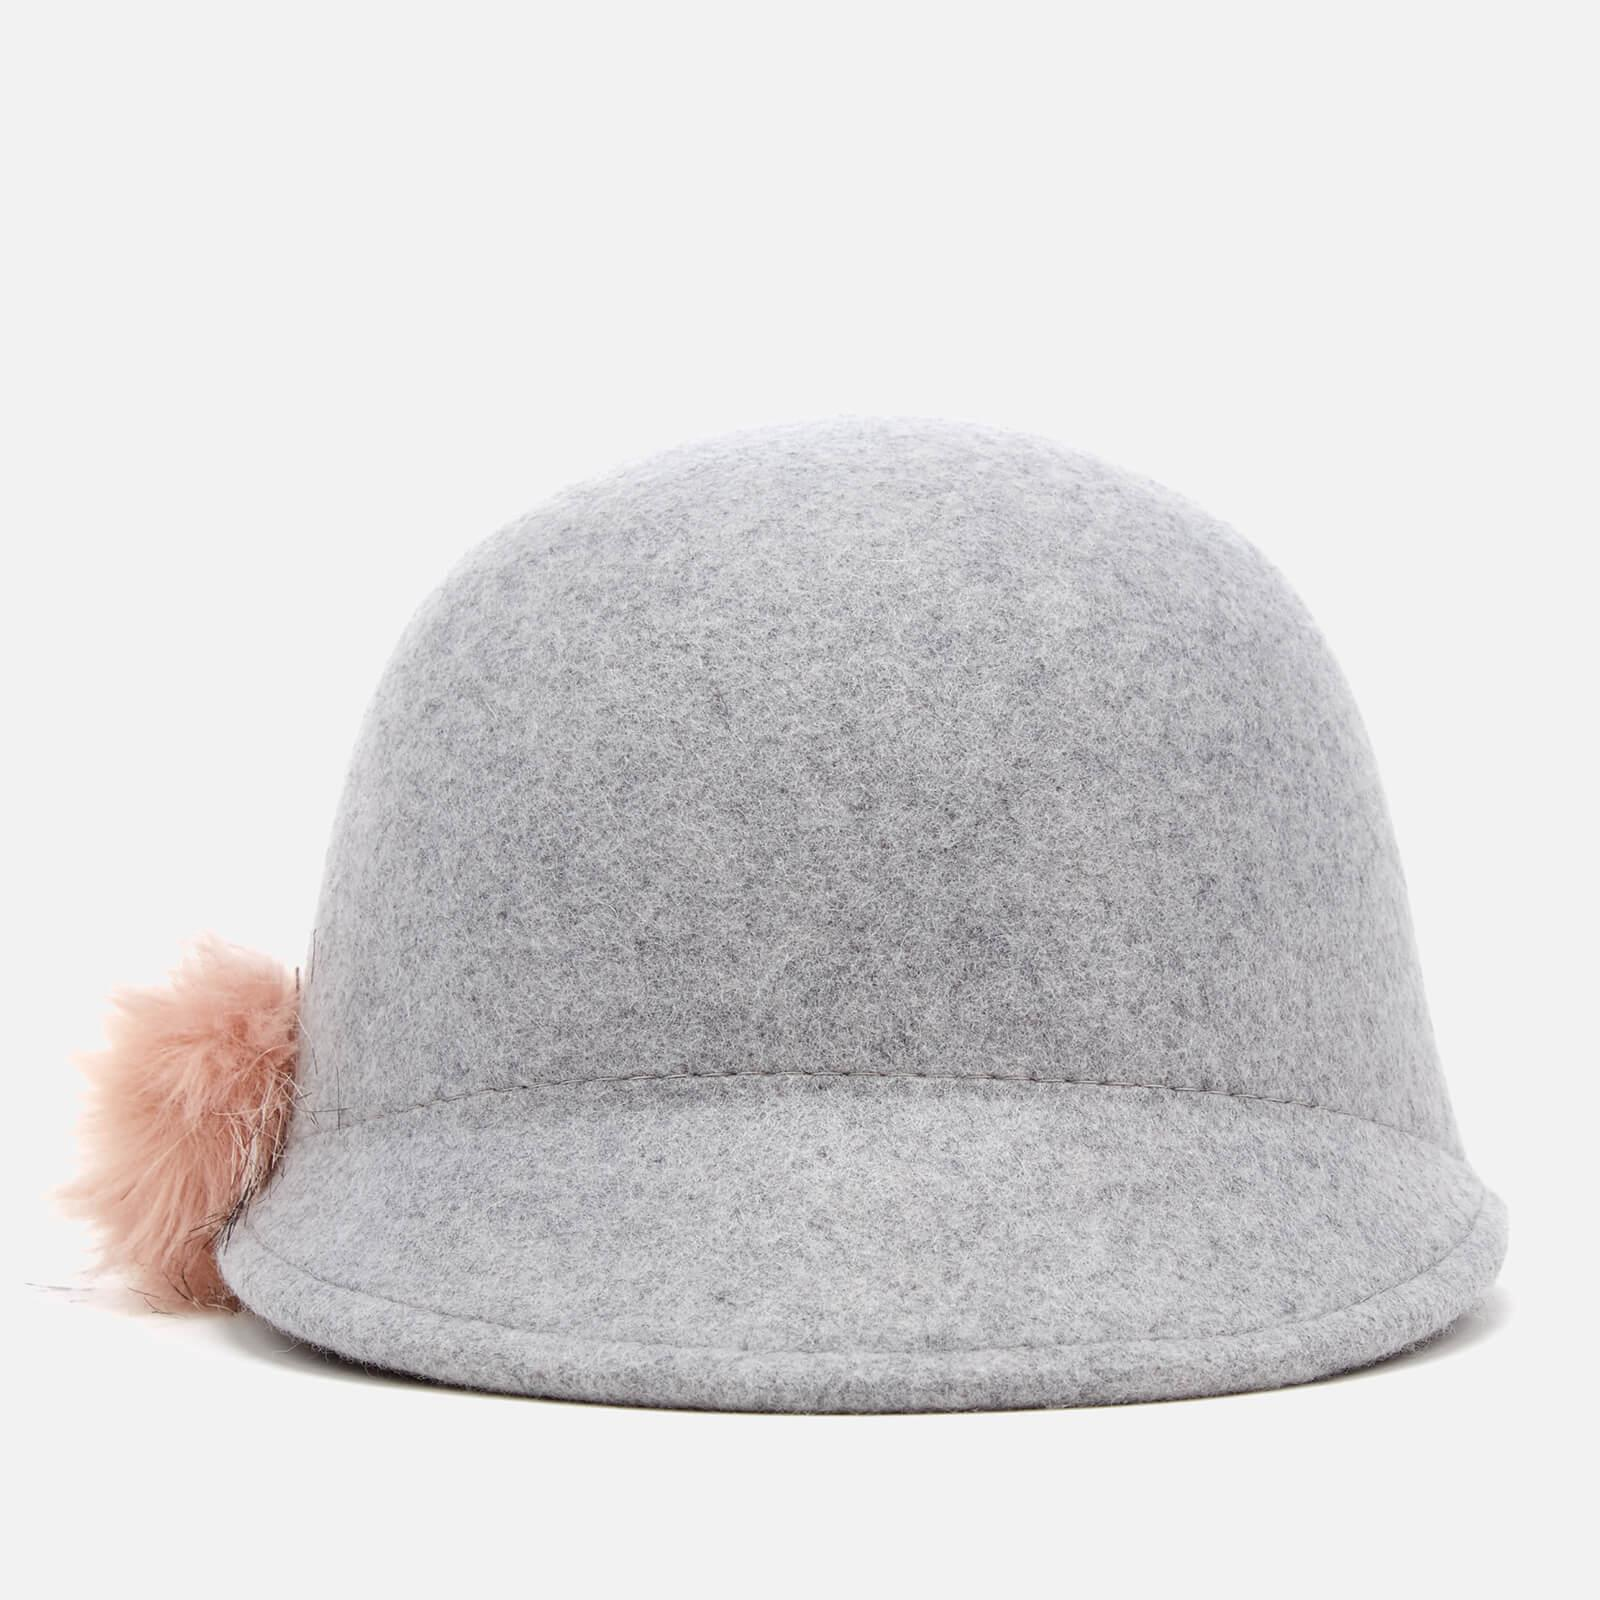 5ad2f82d6ef Ted Baker Adabel Faux Fur Pom Pom Felt Hat in Gray - Lyst